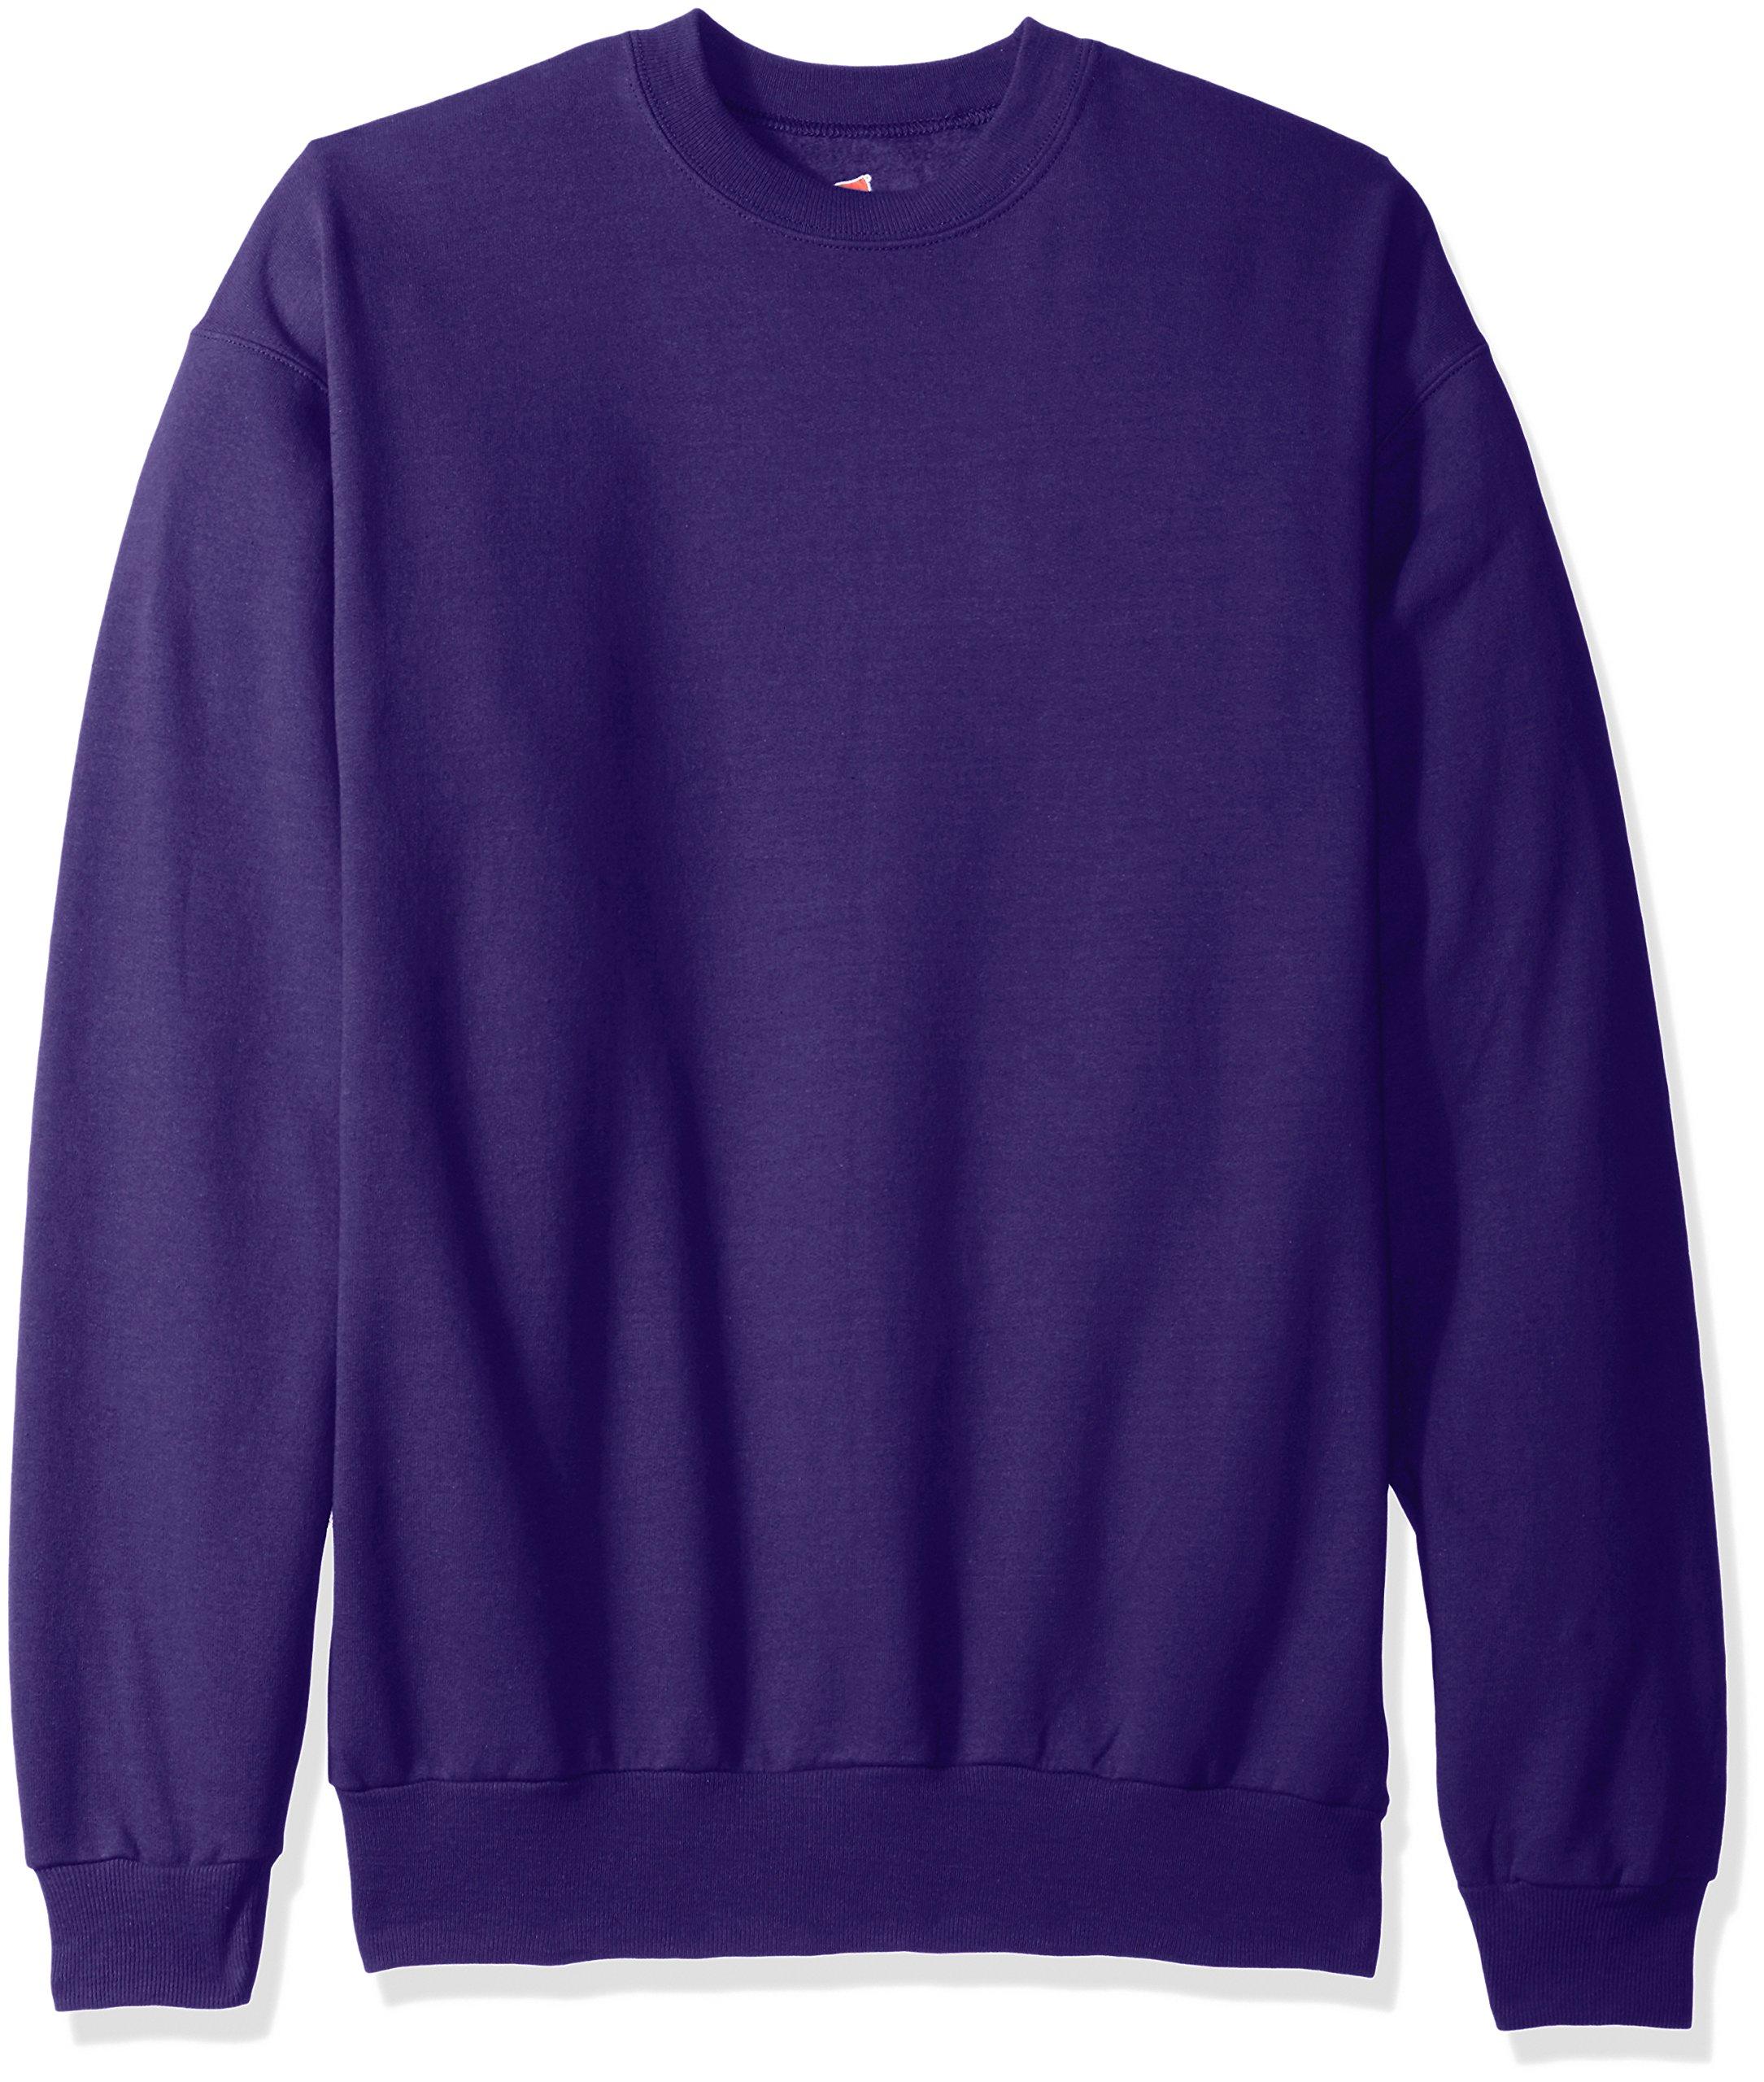 Hanes Men's EcoSmart Fleece Sweatshirt, Purple, Large